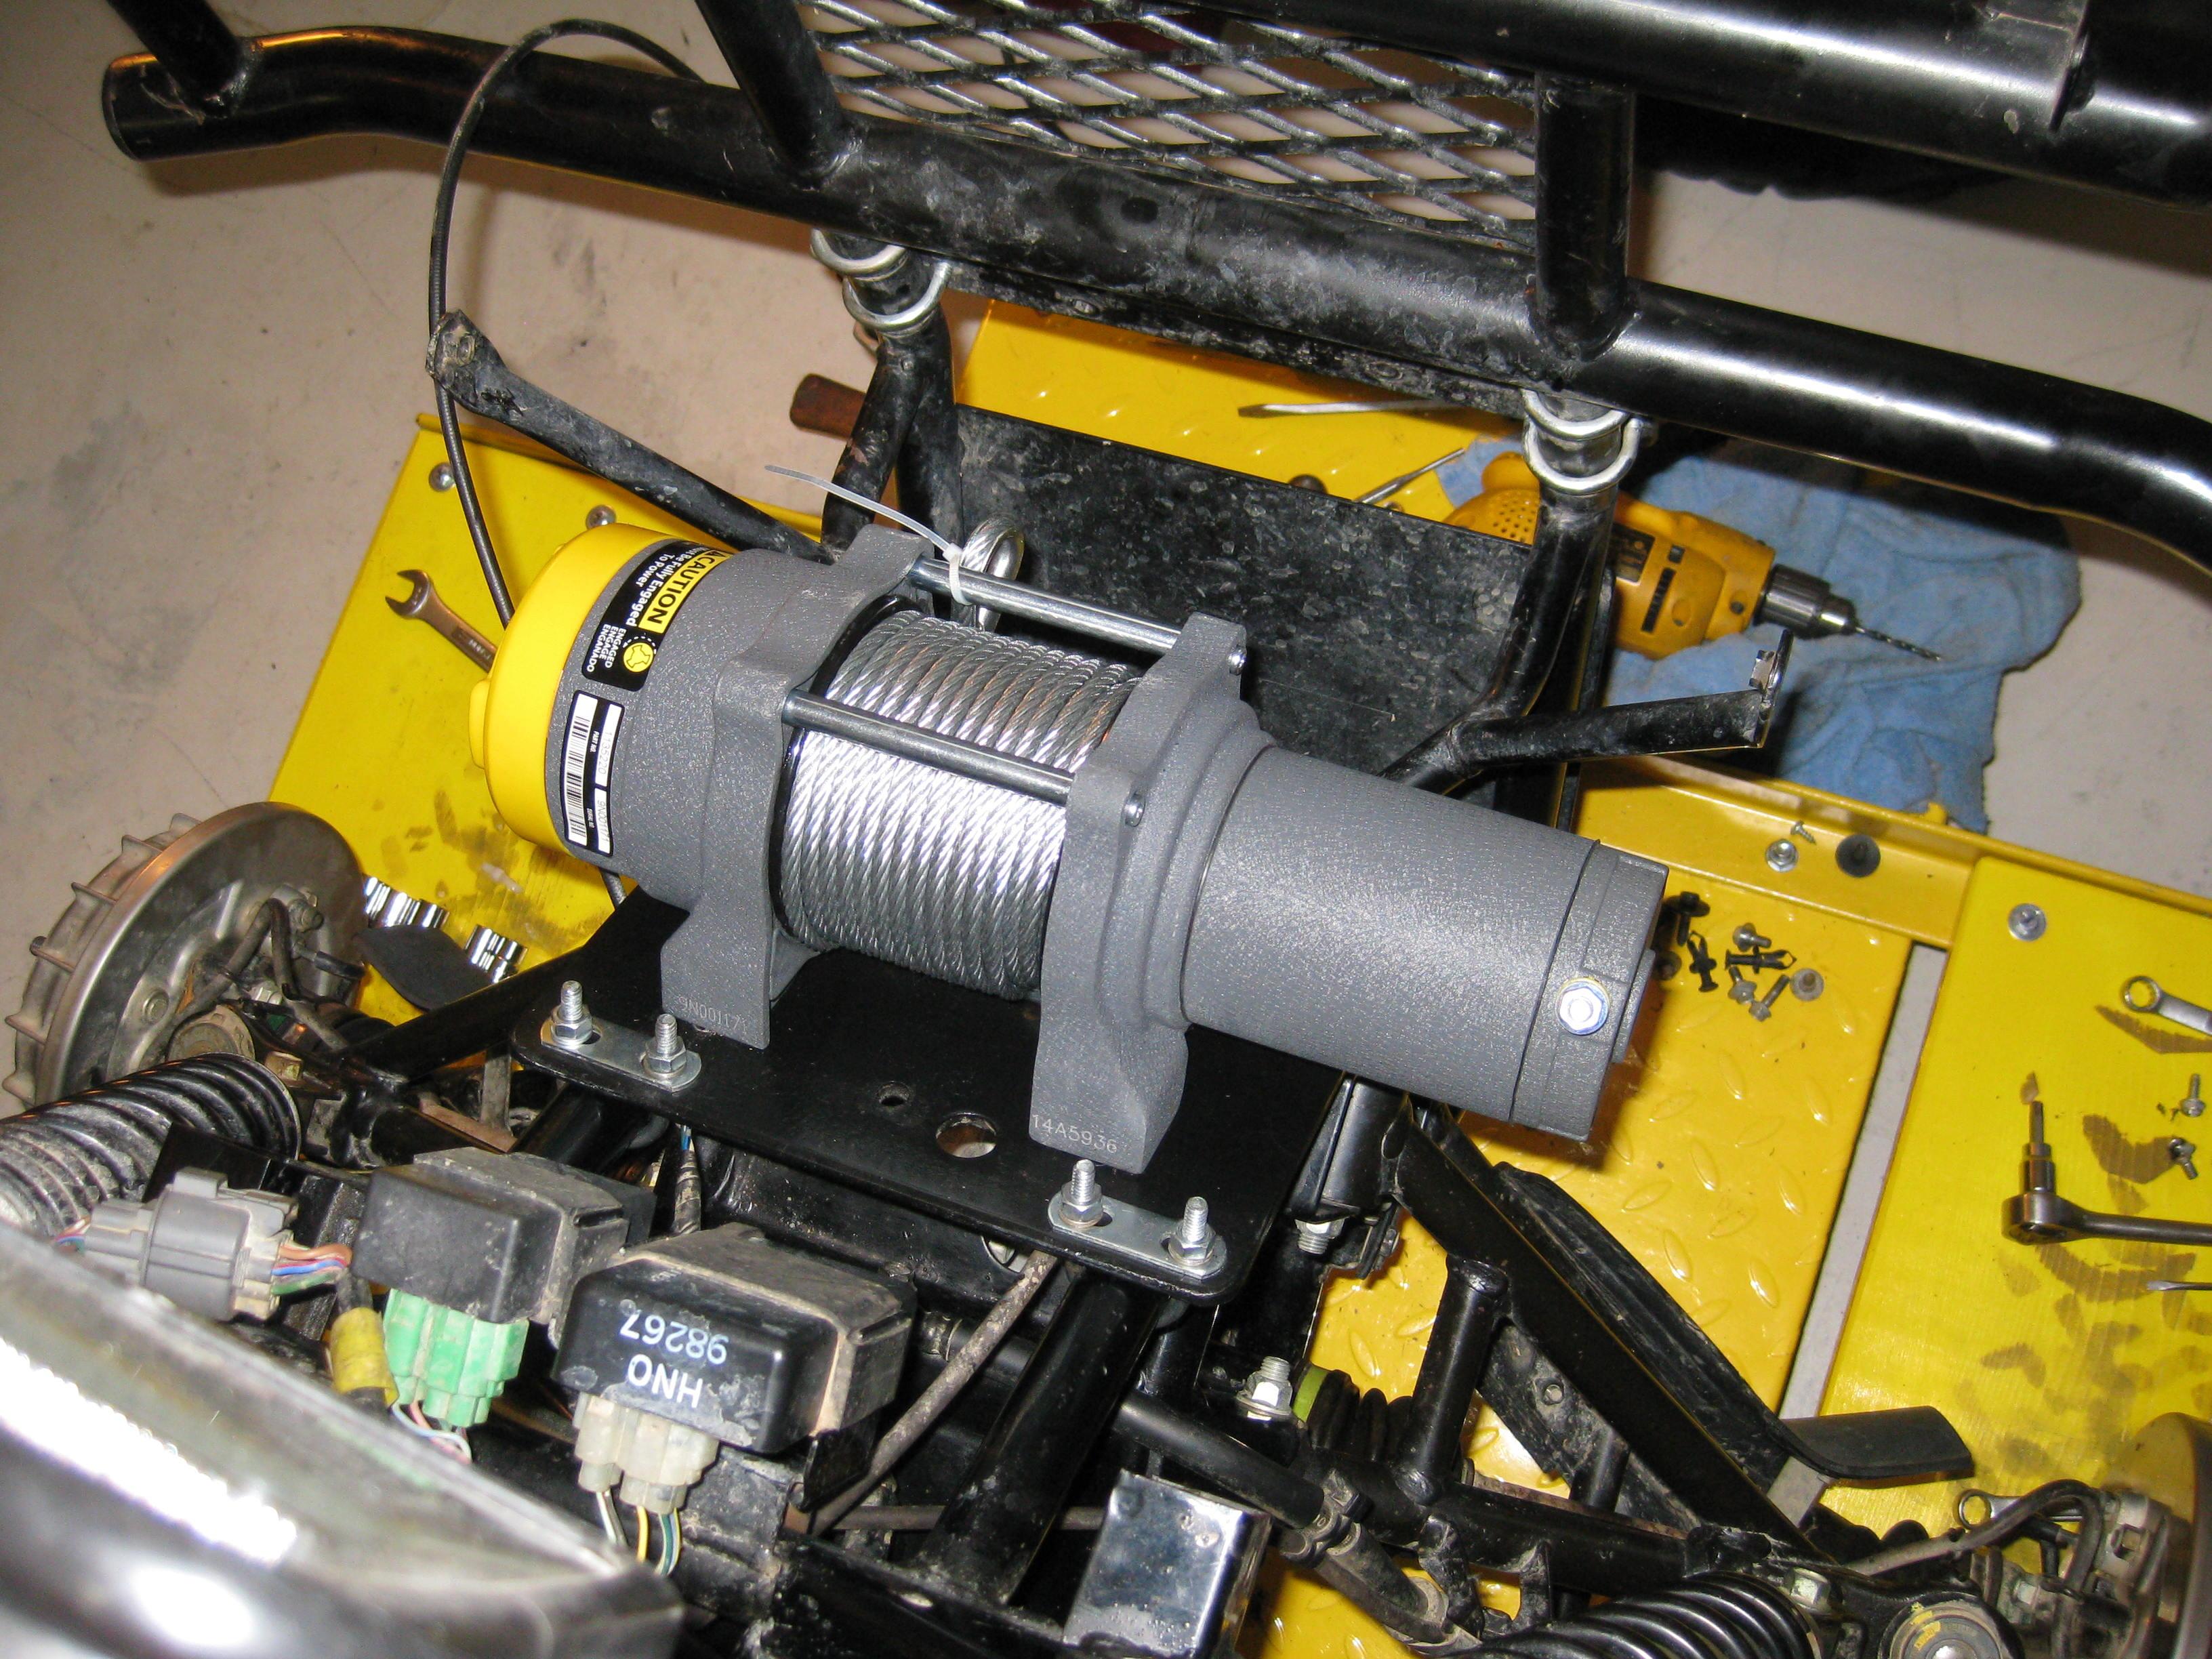 Honda Atv Superwinch Wiring Diagram Libraries 1999 Foreman Amazon Com Terra 35 Forumclick Image For Larger Version Name Img 1350 Views